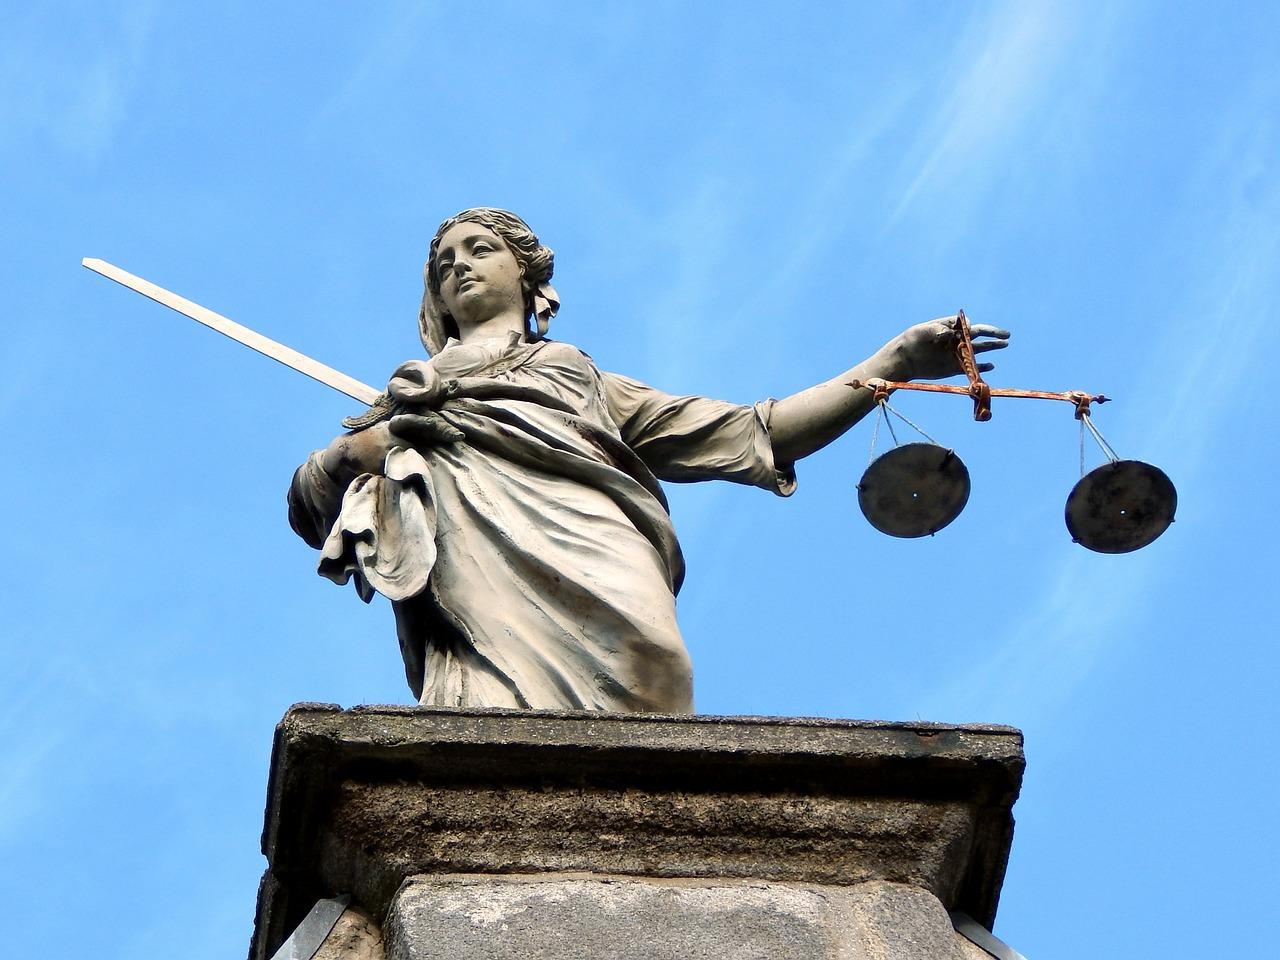 delito de denuncia falsa jurisprudencia al respecto